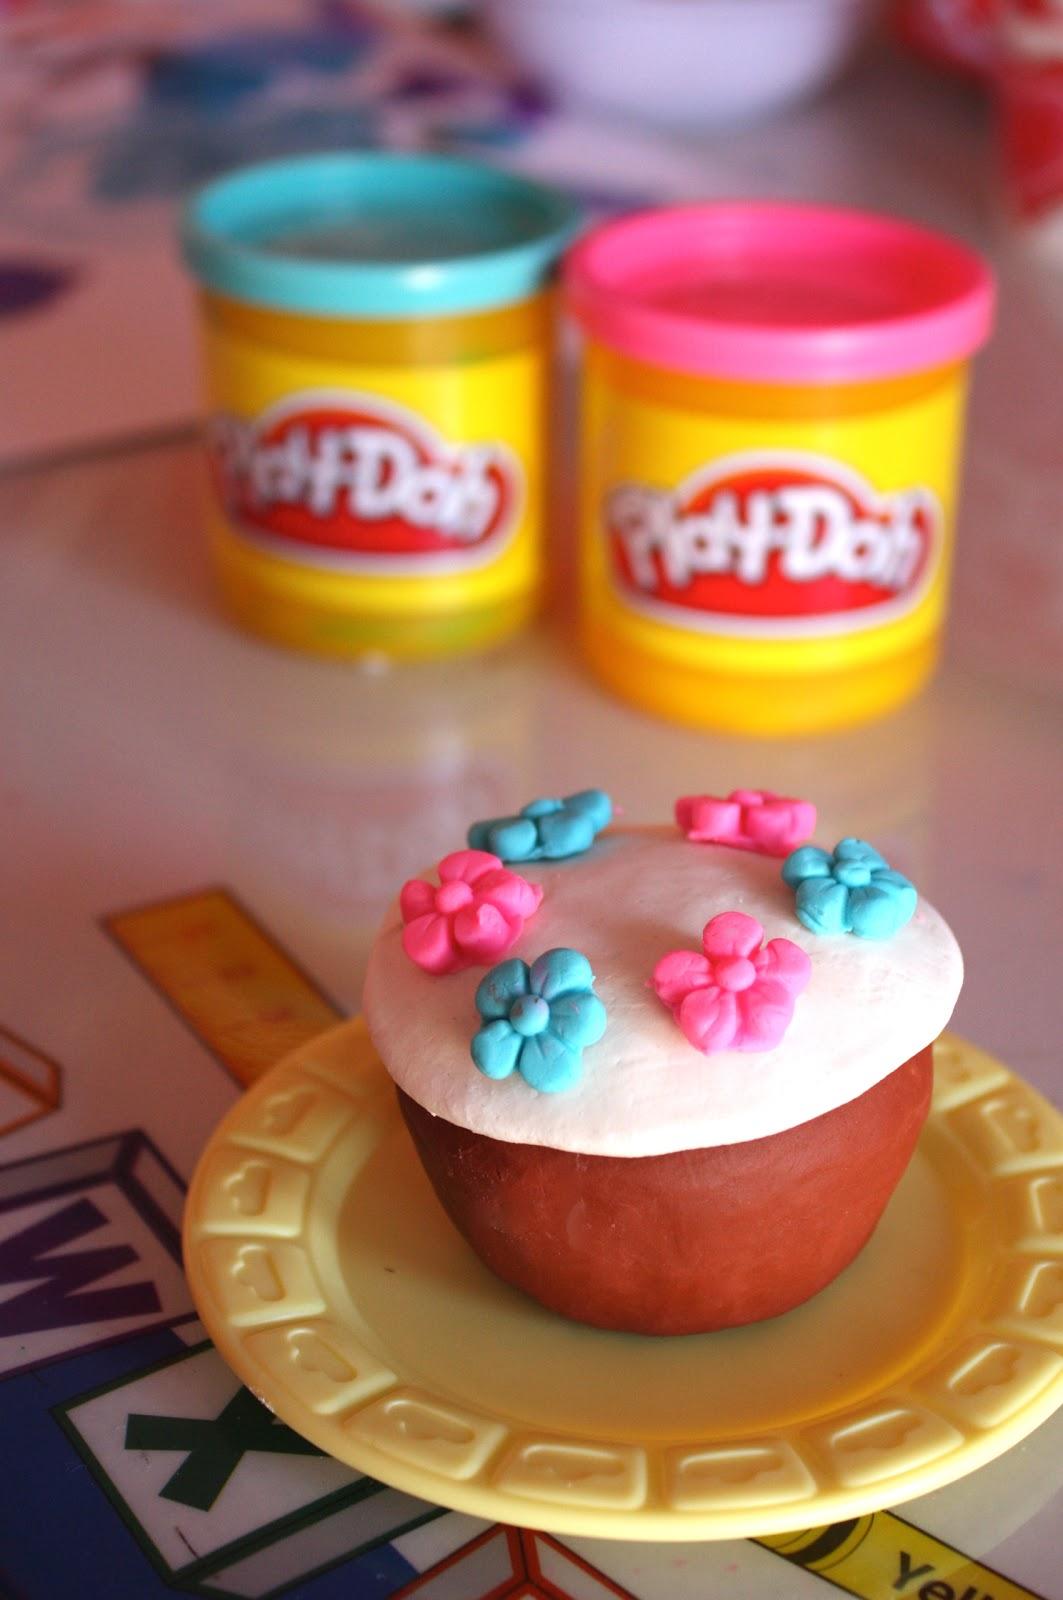 Cake Making Station Play Doh